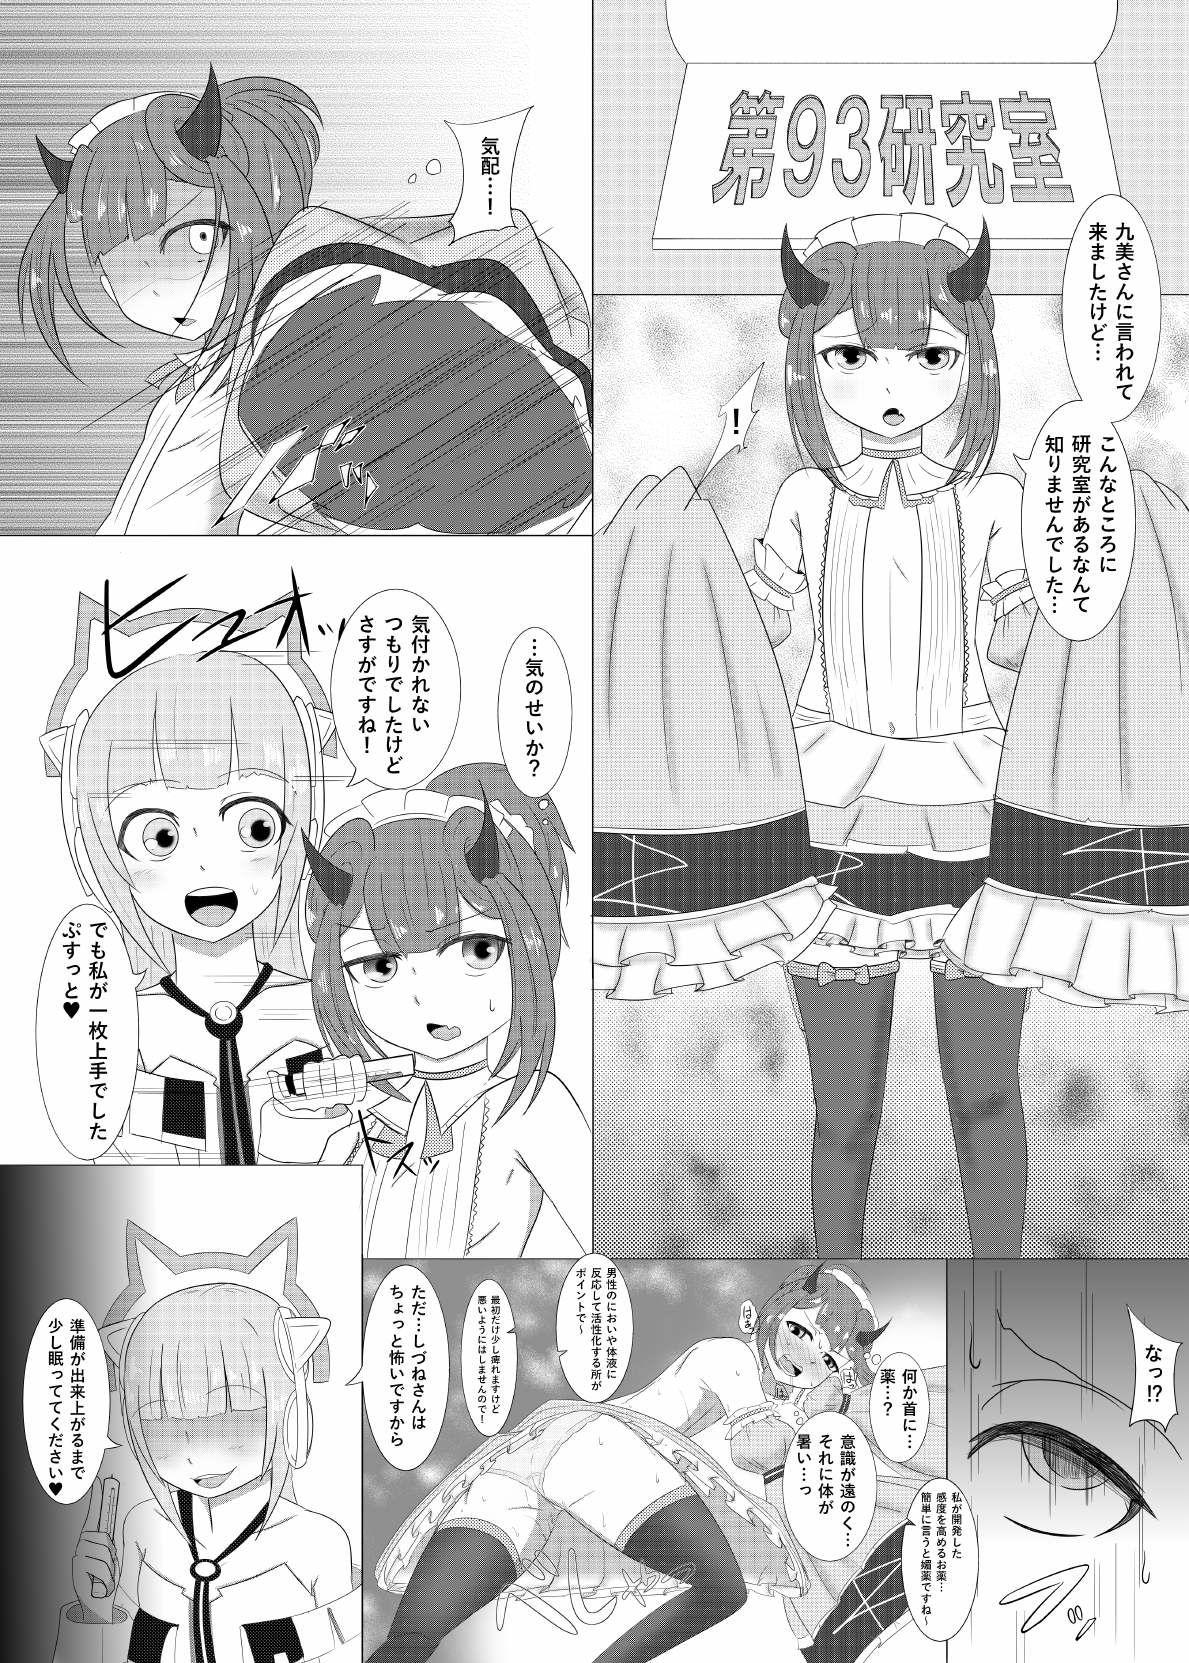 C93オマケ漫画 0